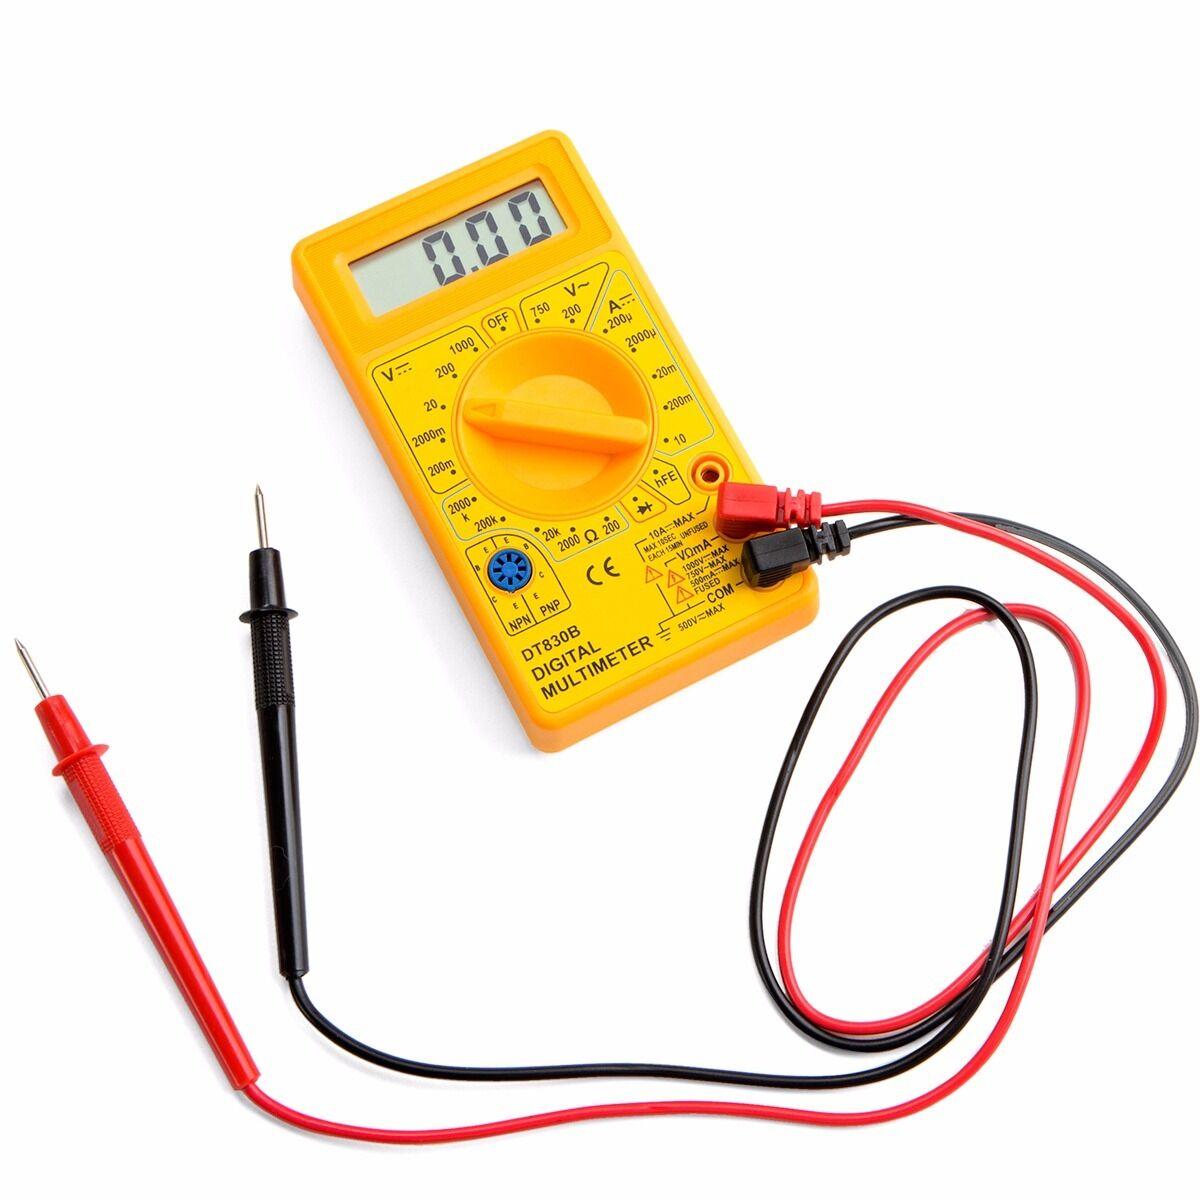 Hand Held Ohmmeter : Portable ammeter voltmeter handheld tester ohmmeter lcd